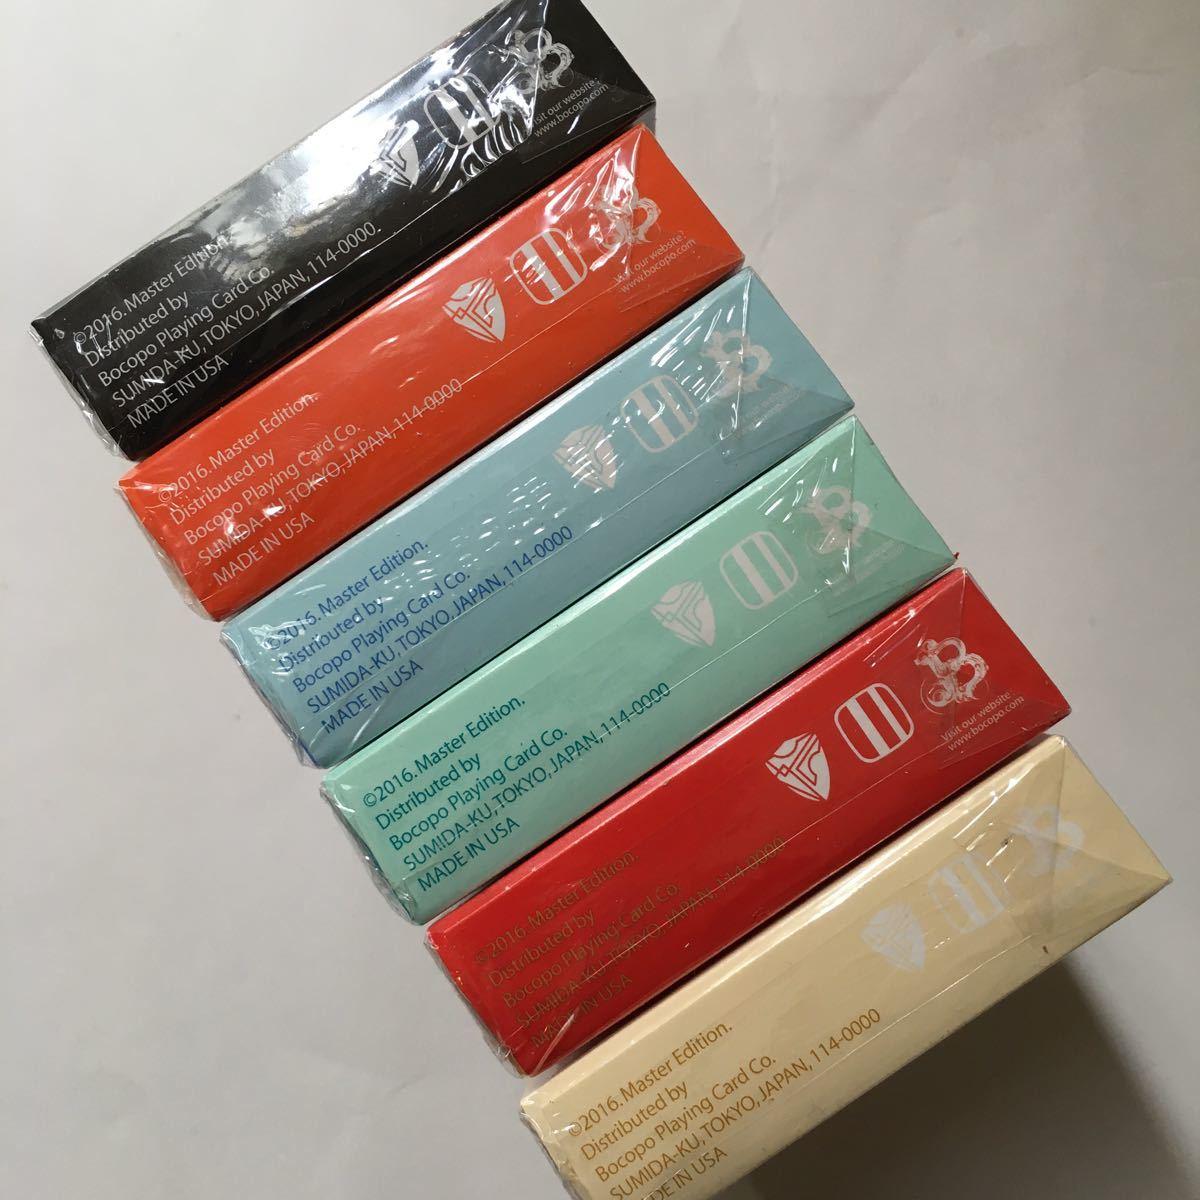 Magic Notebook Deck Bocopo Playing Cards Dai Vernon 新品 6デックセット_画像5